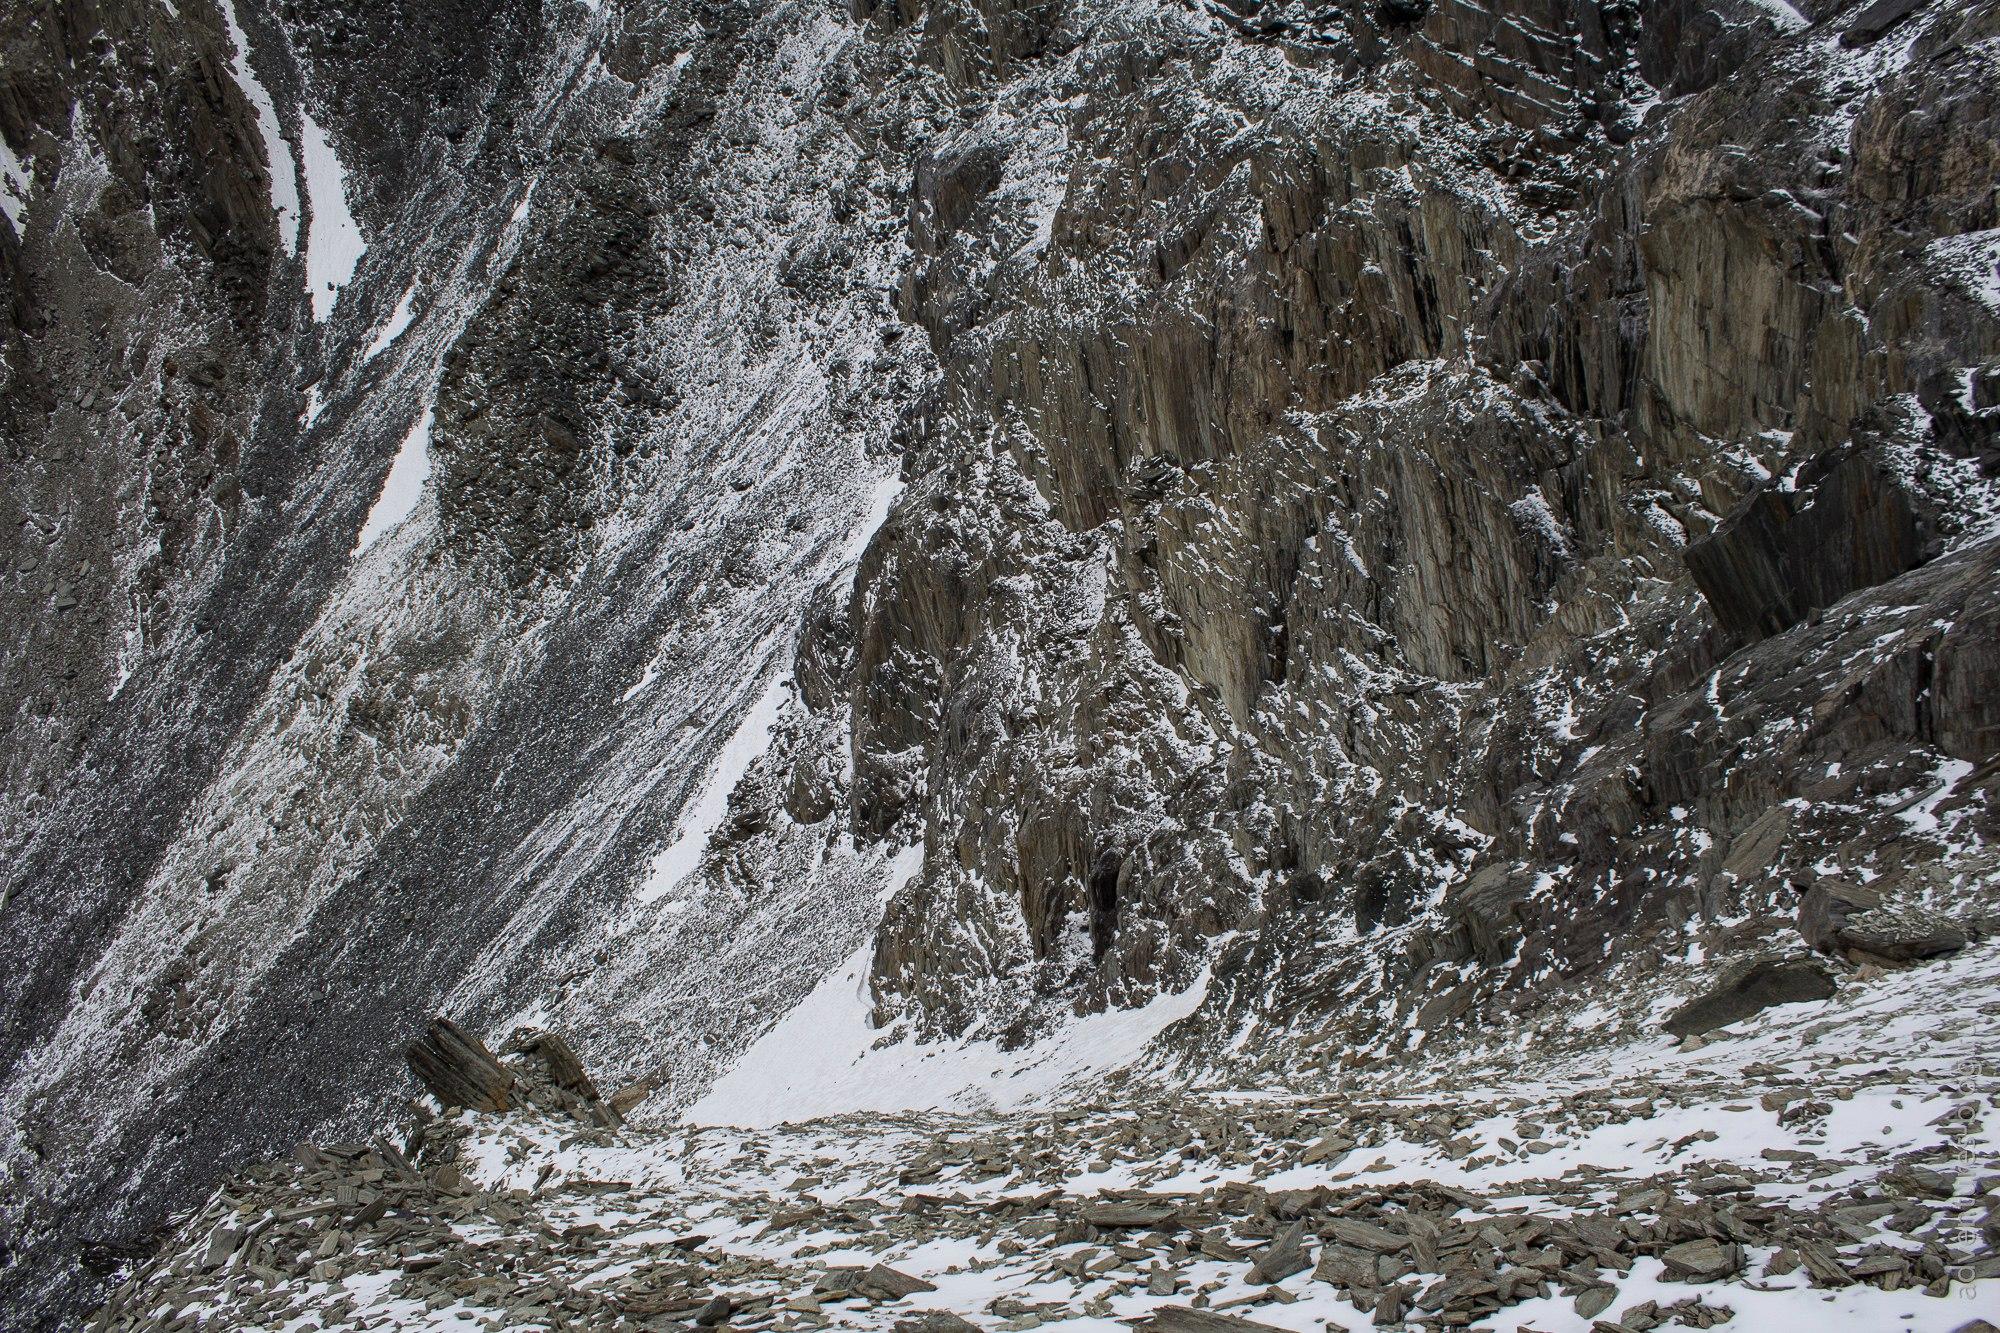 Спуск с перевала Абыл-оюк